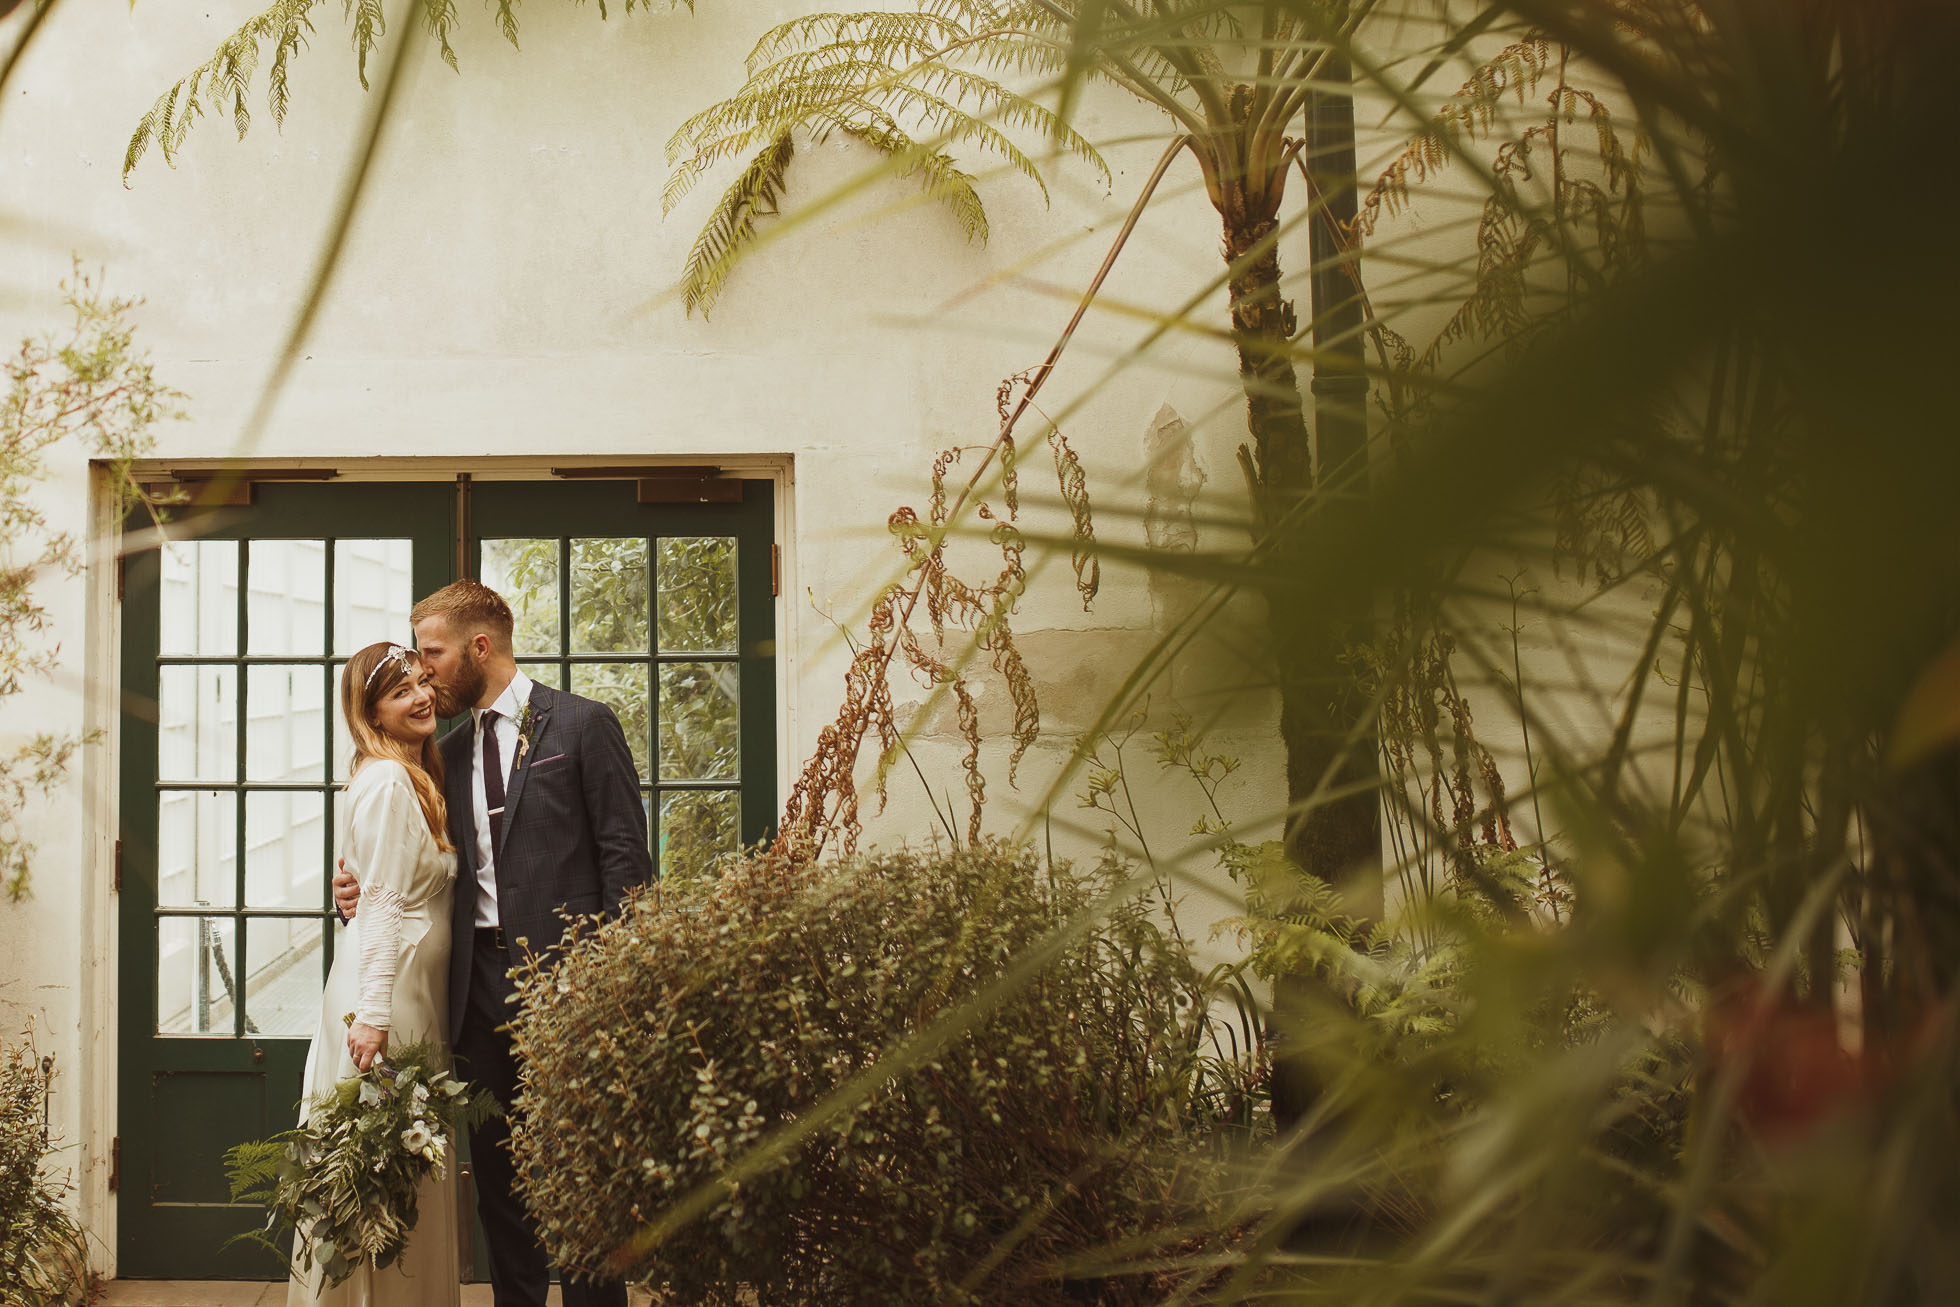 sheffield-botanical-gardens-wedding-photographer-41.jpg